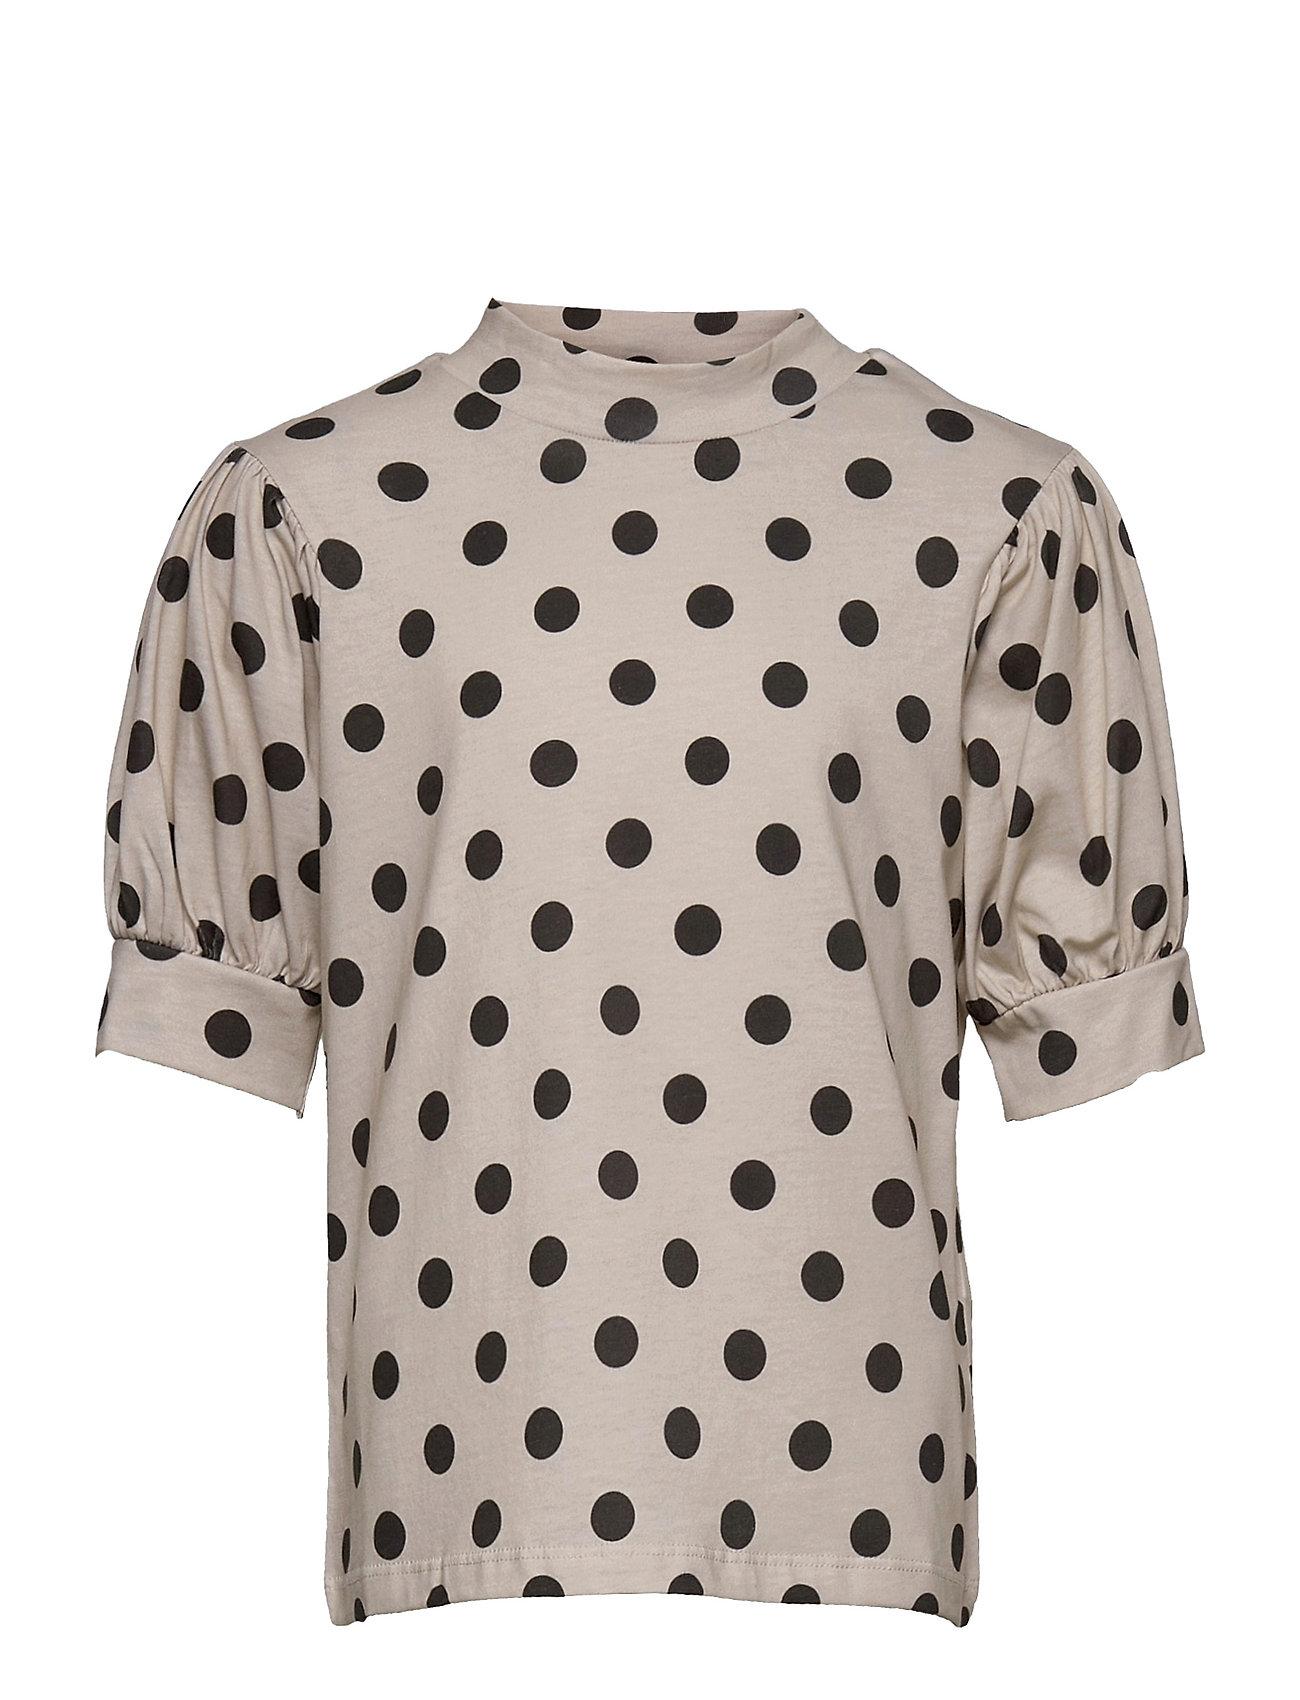 Nlffluff Ballon Short R Top Bluse Tunika Sort LMTD